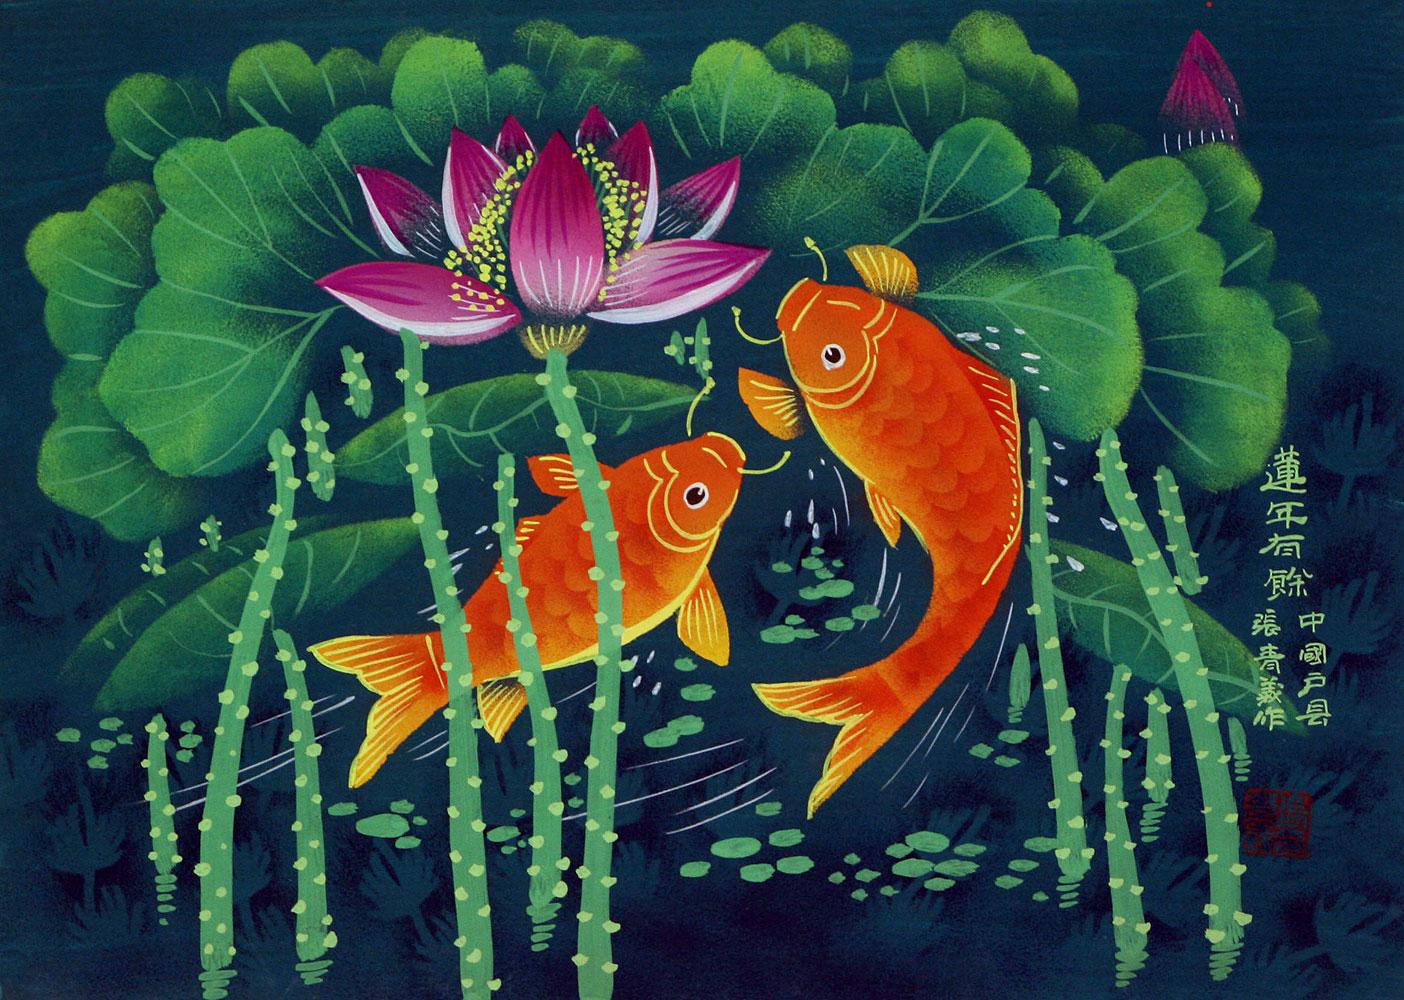 Koi Fish And Lotus Flowers Chinese Folk Art Painting South